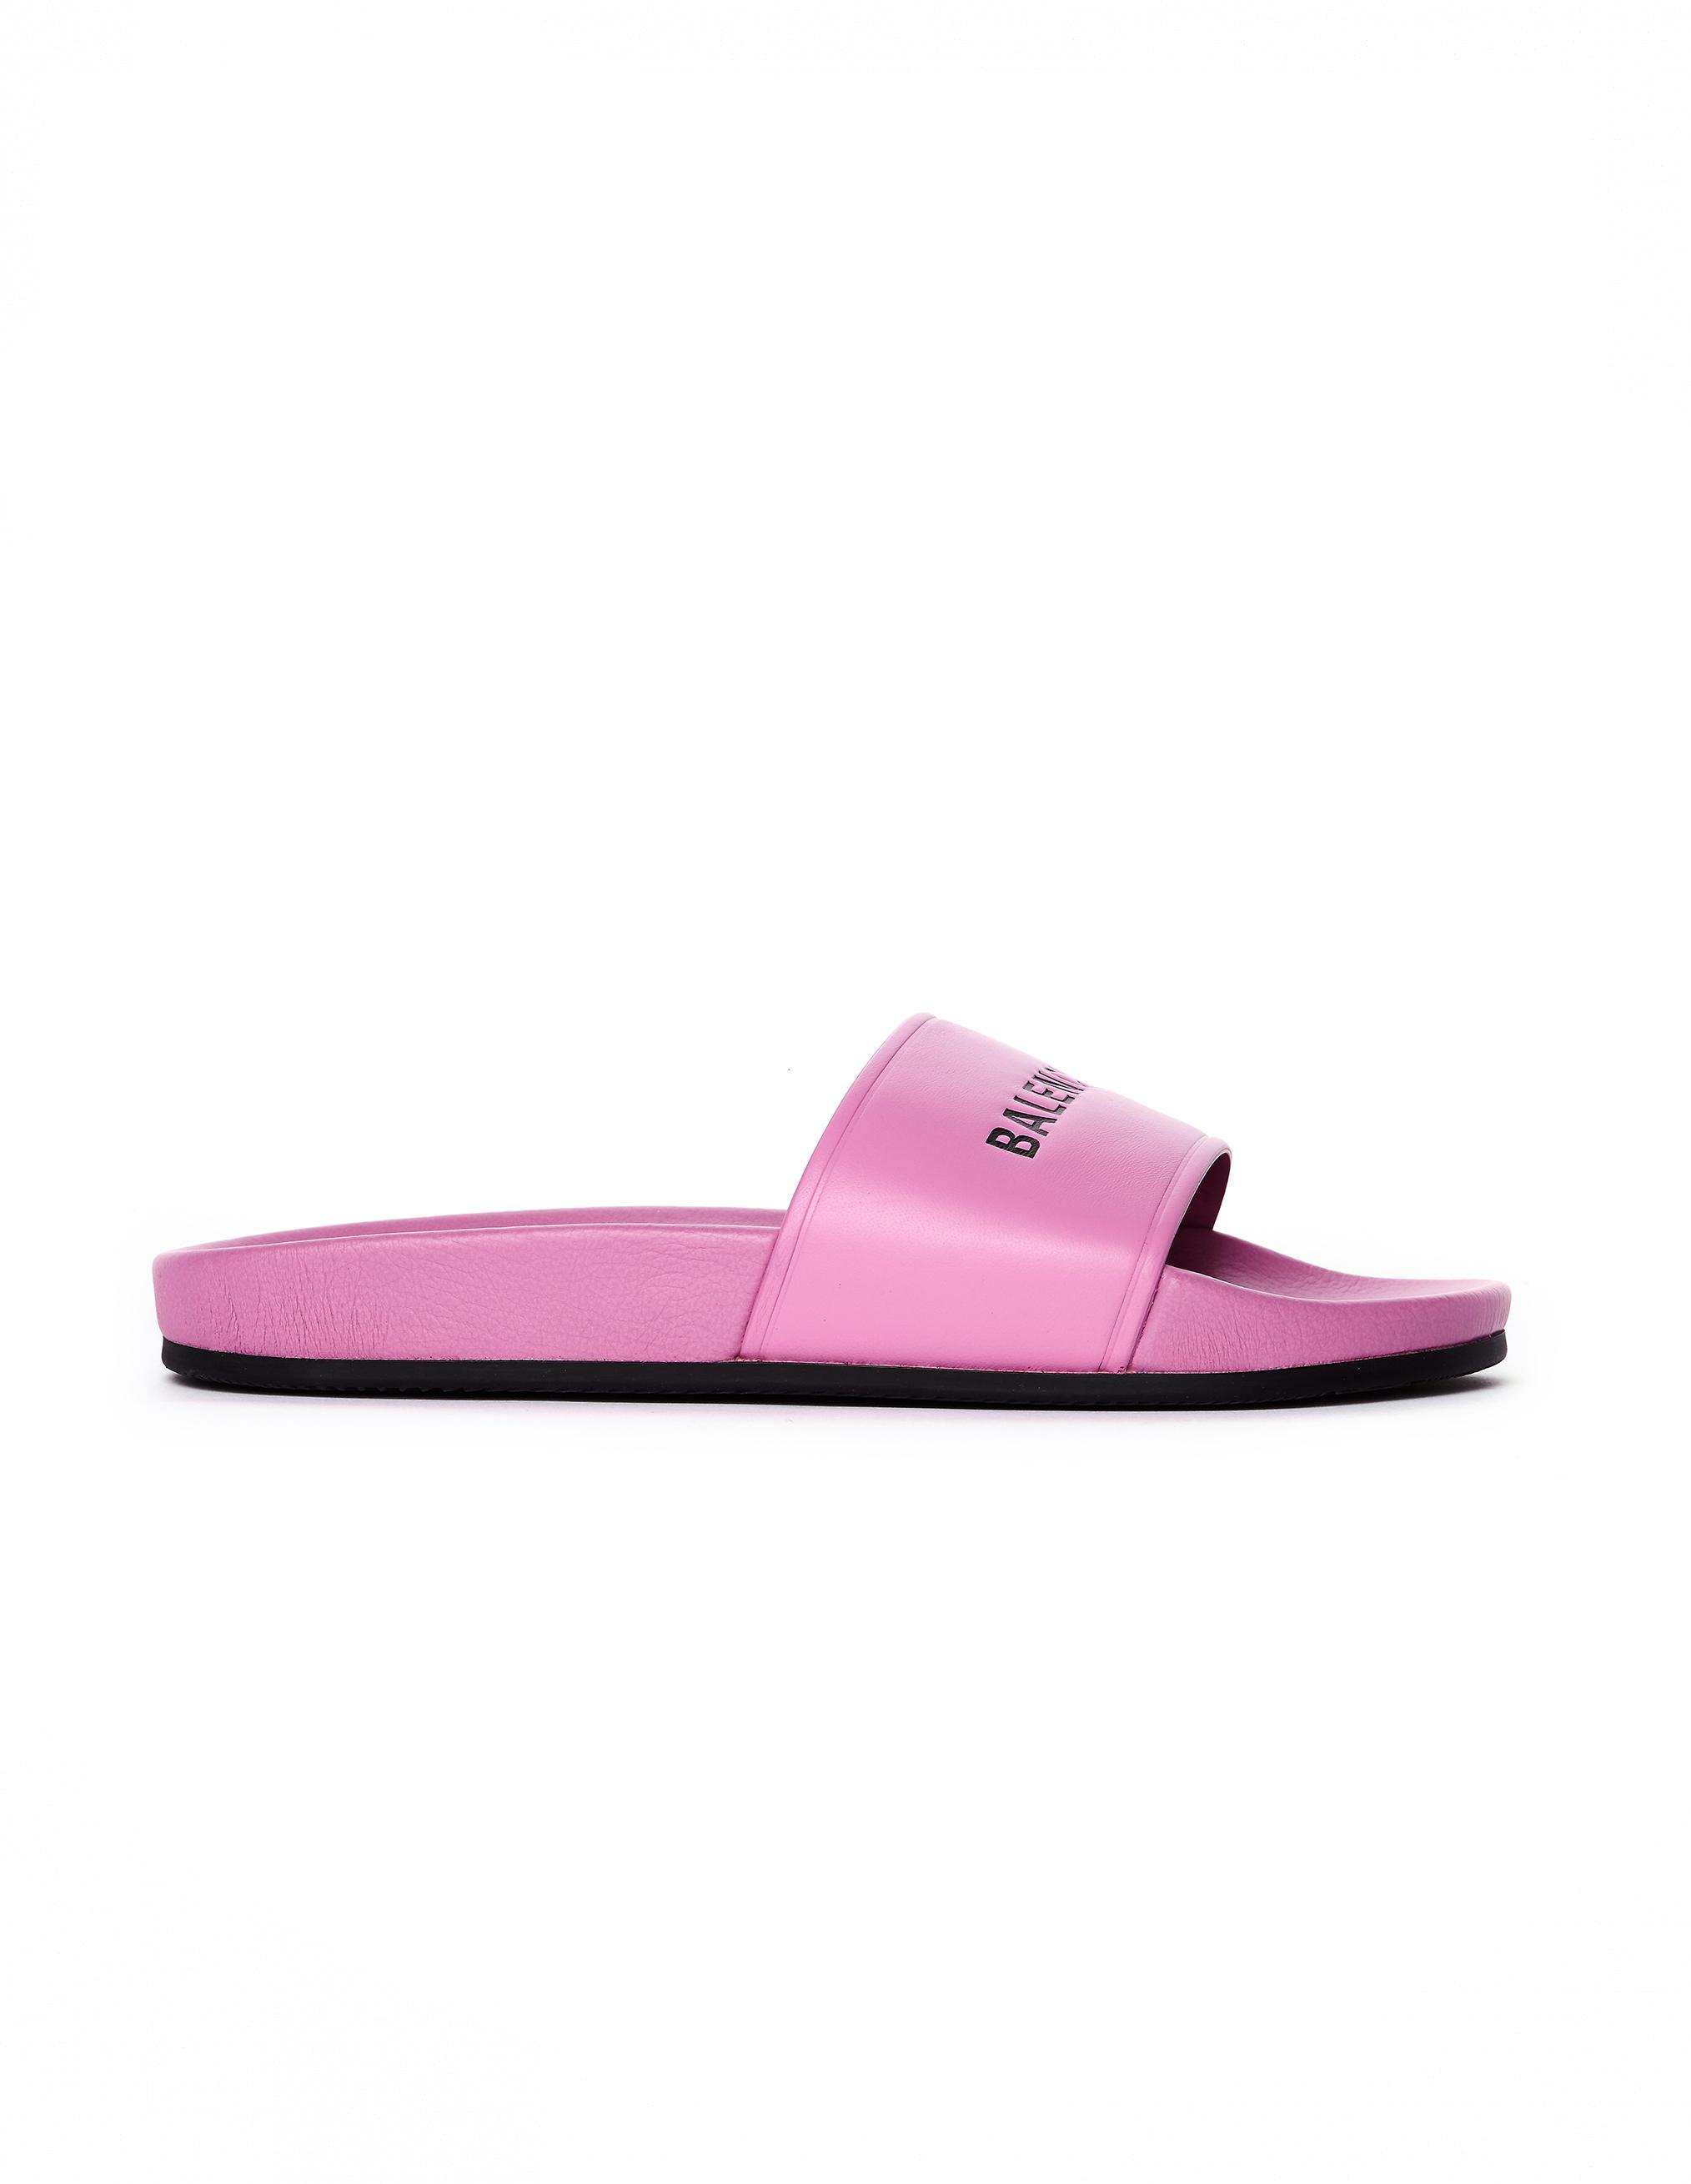 b68880f122ec5d Balenciaga - Pink Pool Leather Logo Slides - Lyst. View fullscreen